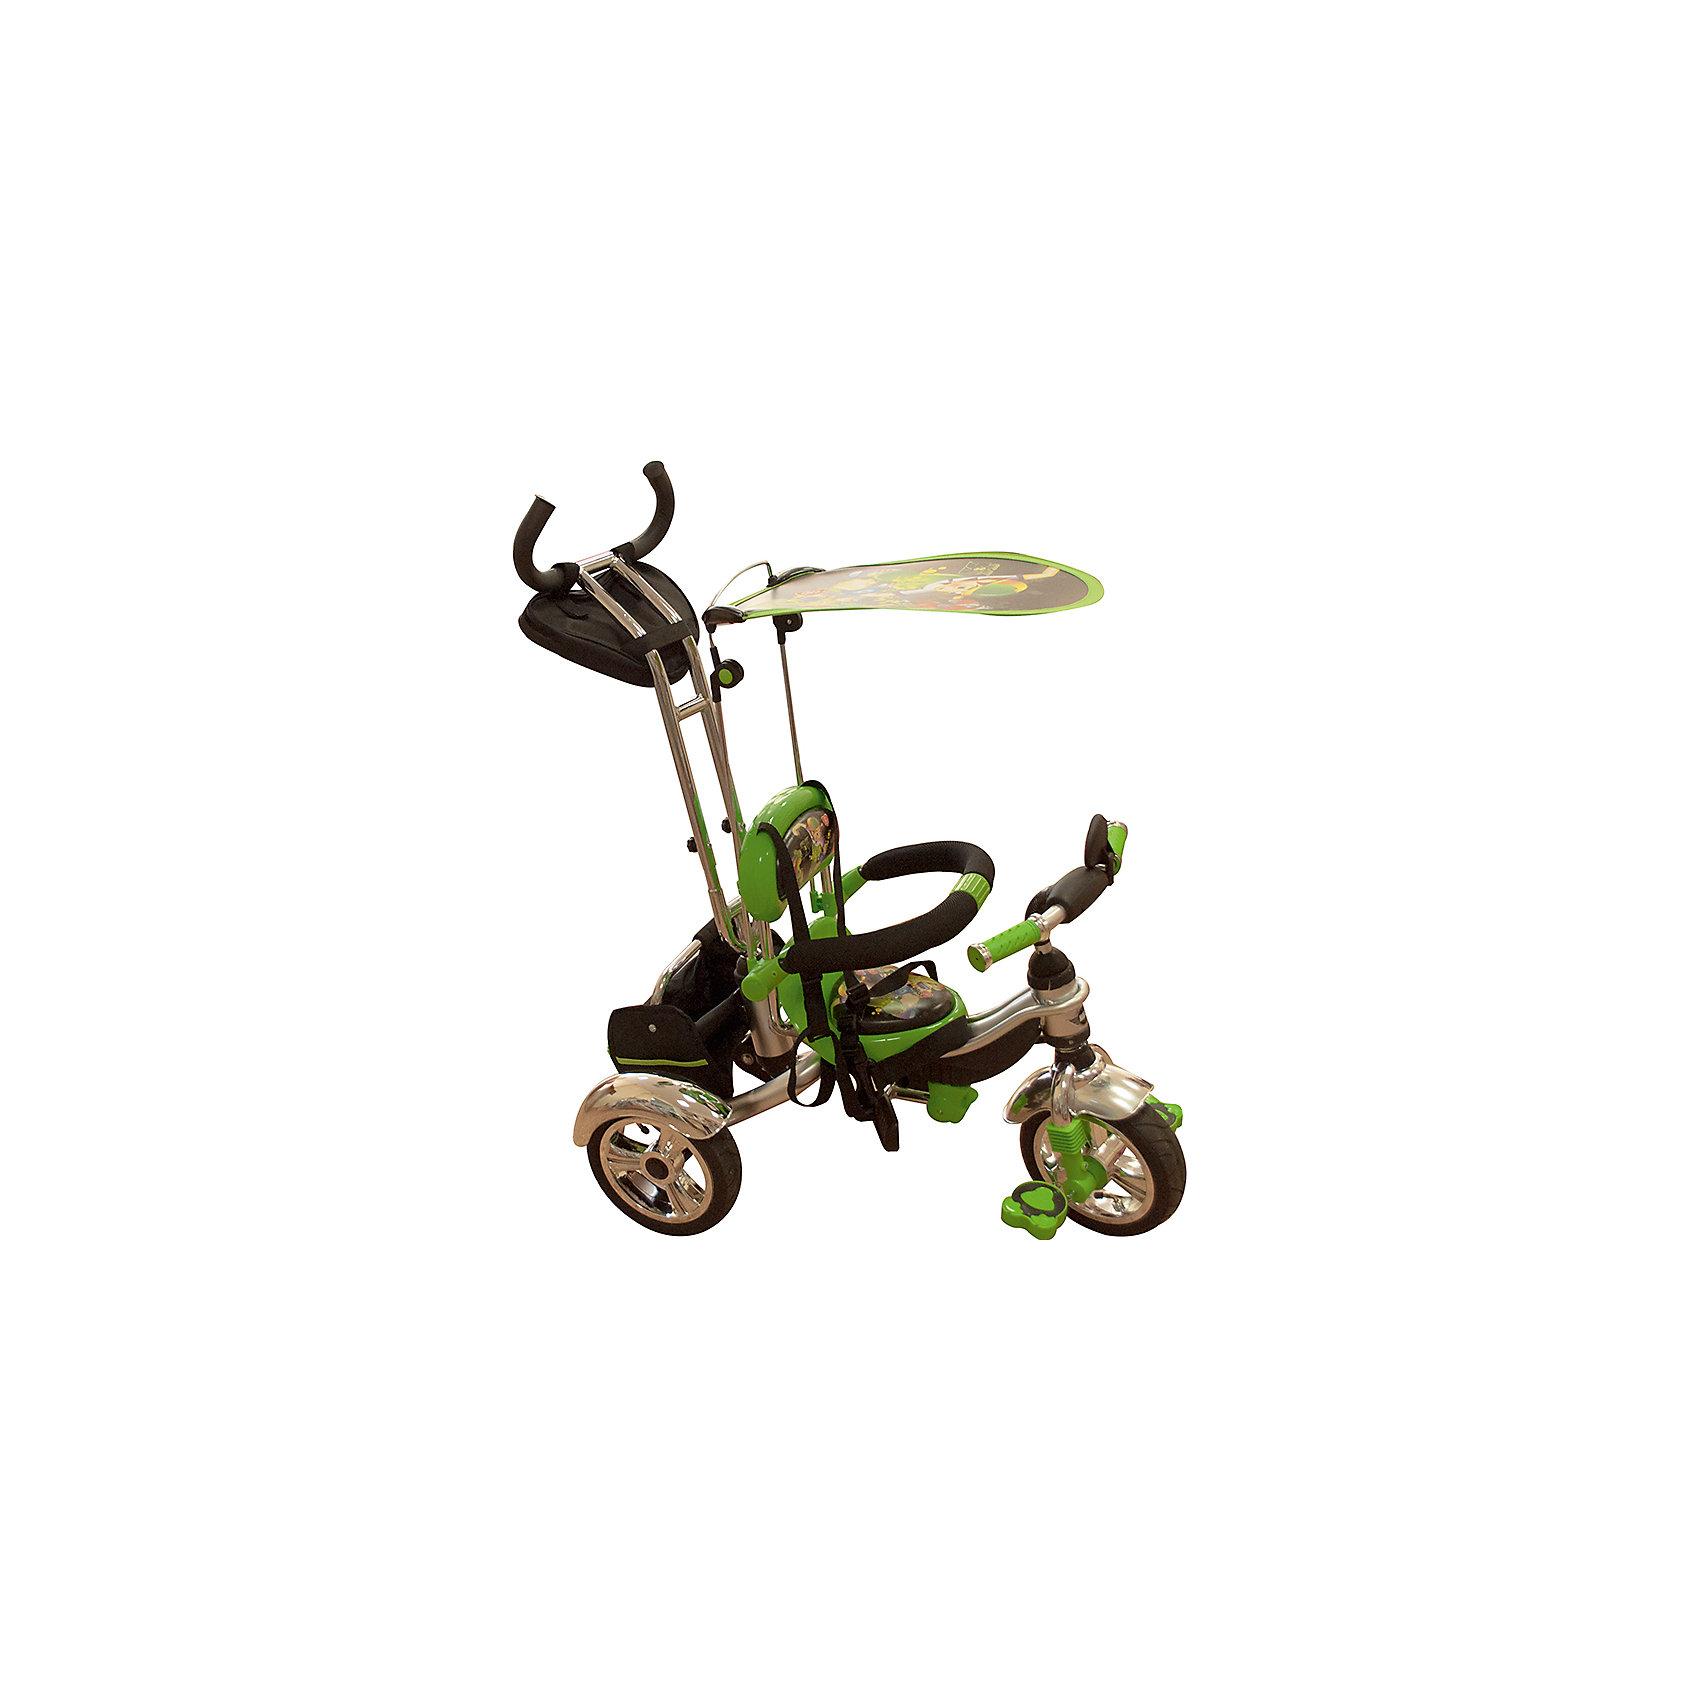 Велосипед трехколесный, зеленый, MARS TRIKE<br><br>Ширина мм: 860<br>Глубина мм: 500<br>Высота мм: 1000<br>Вес г: 12000<br>Возраст от месяцев: 24<br>Возраст до месяцев: 48<br>Пол: Унисекс<br>Возраст: Детский<br>SKU: 4785492